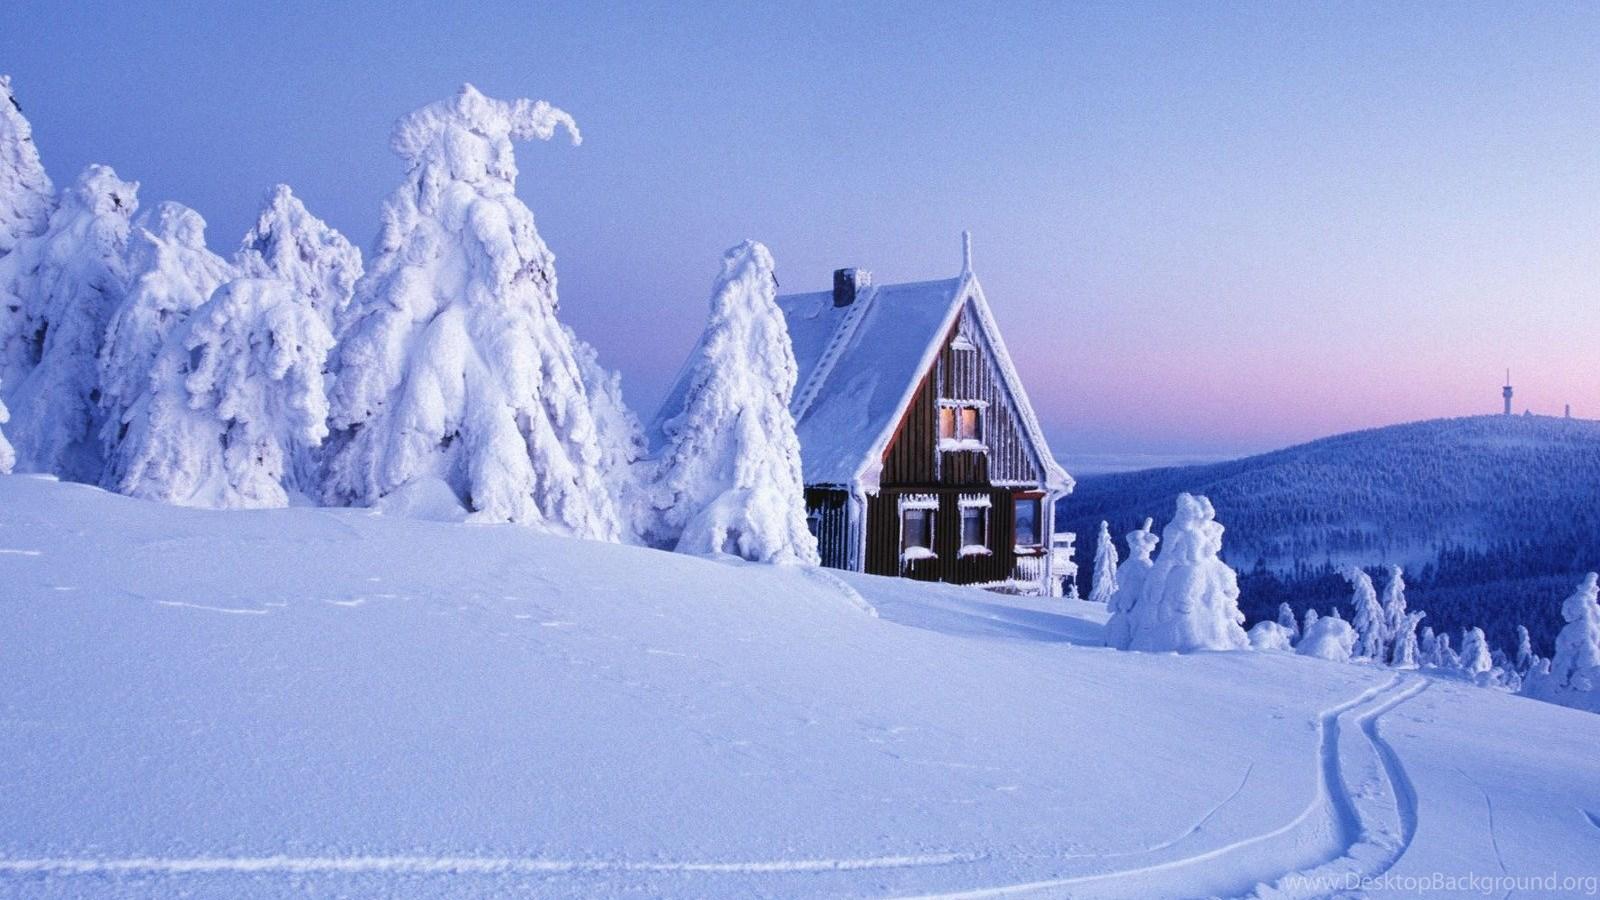 New Winter Cabin Christmas Scene Log Deep Snow Wallpapers Desktop Background